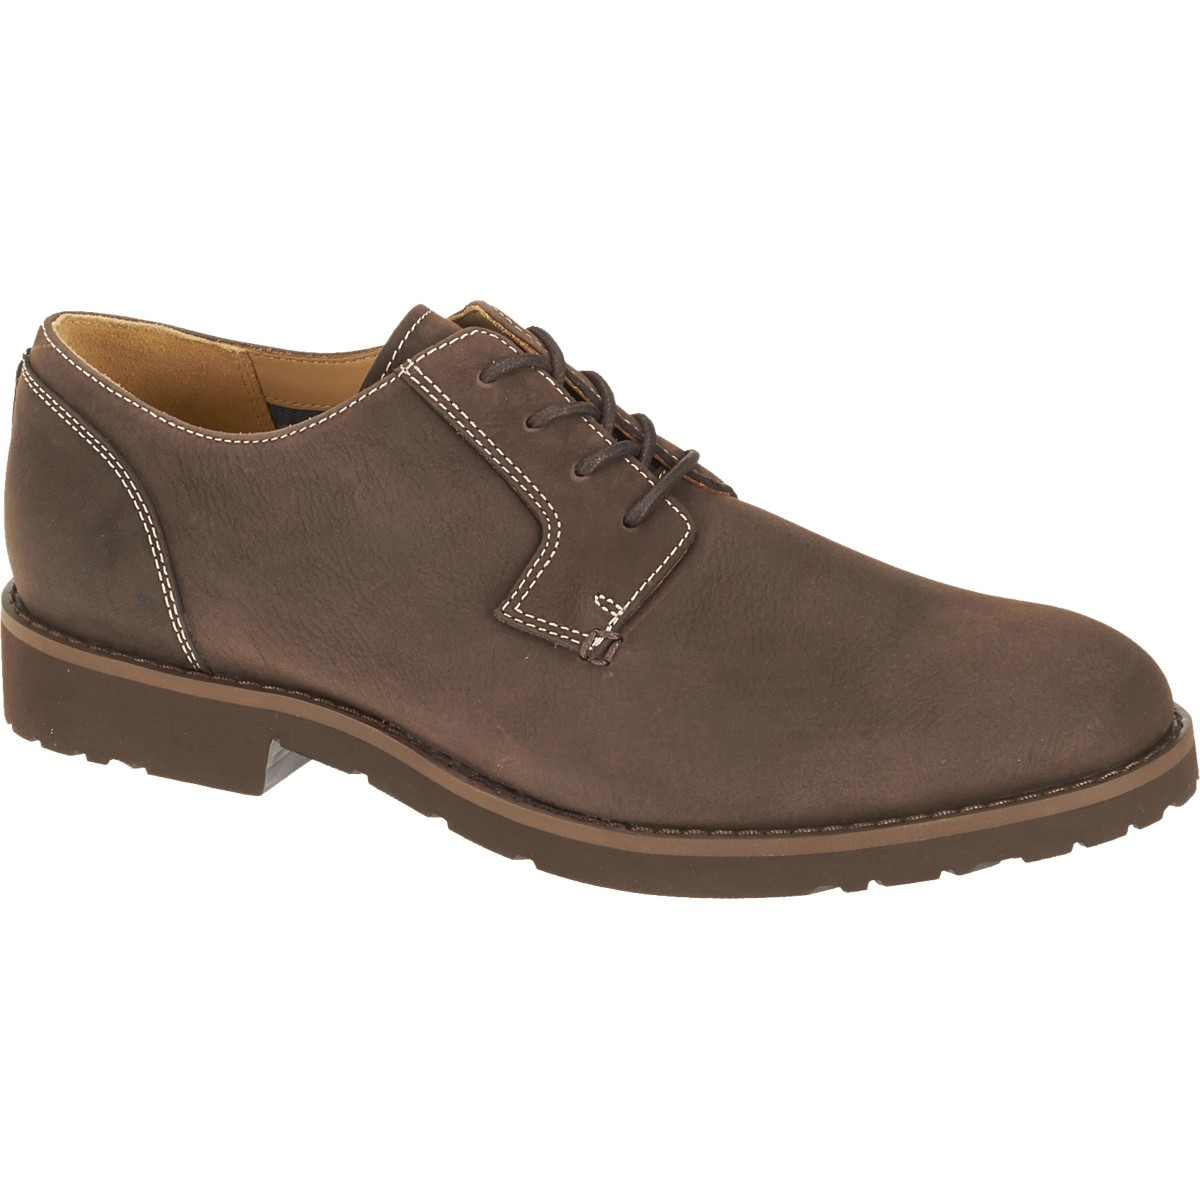 Sebago Rutland Lace Up Shoes (Men's) - Medium Brown Nubuck kind Intellectuality